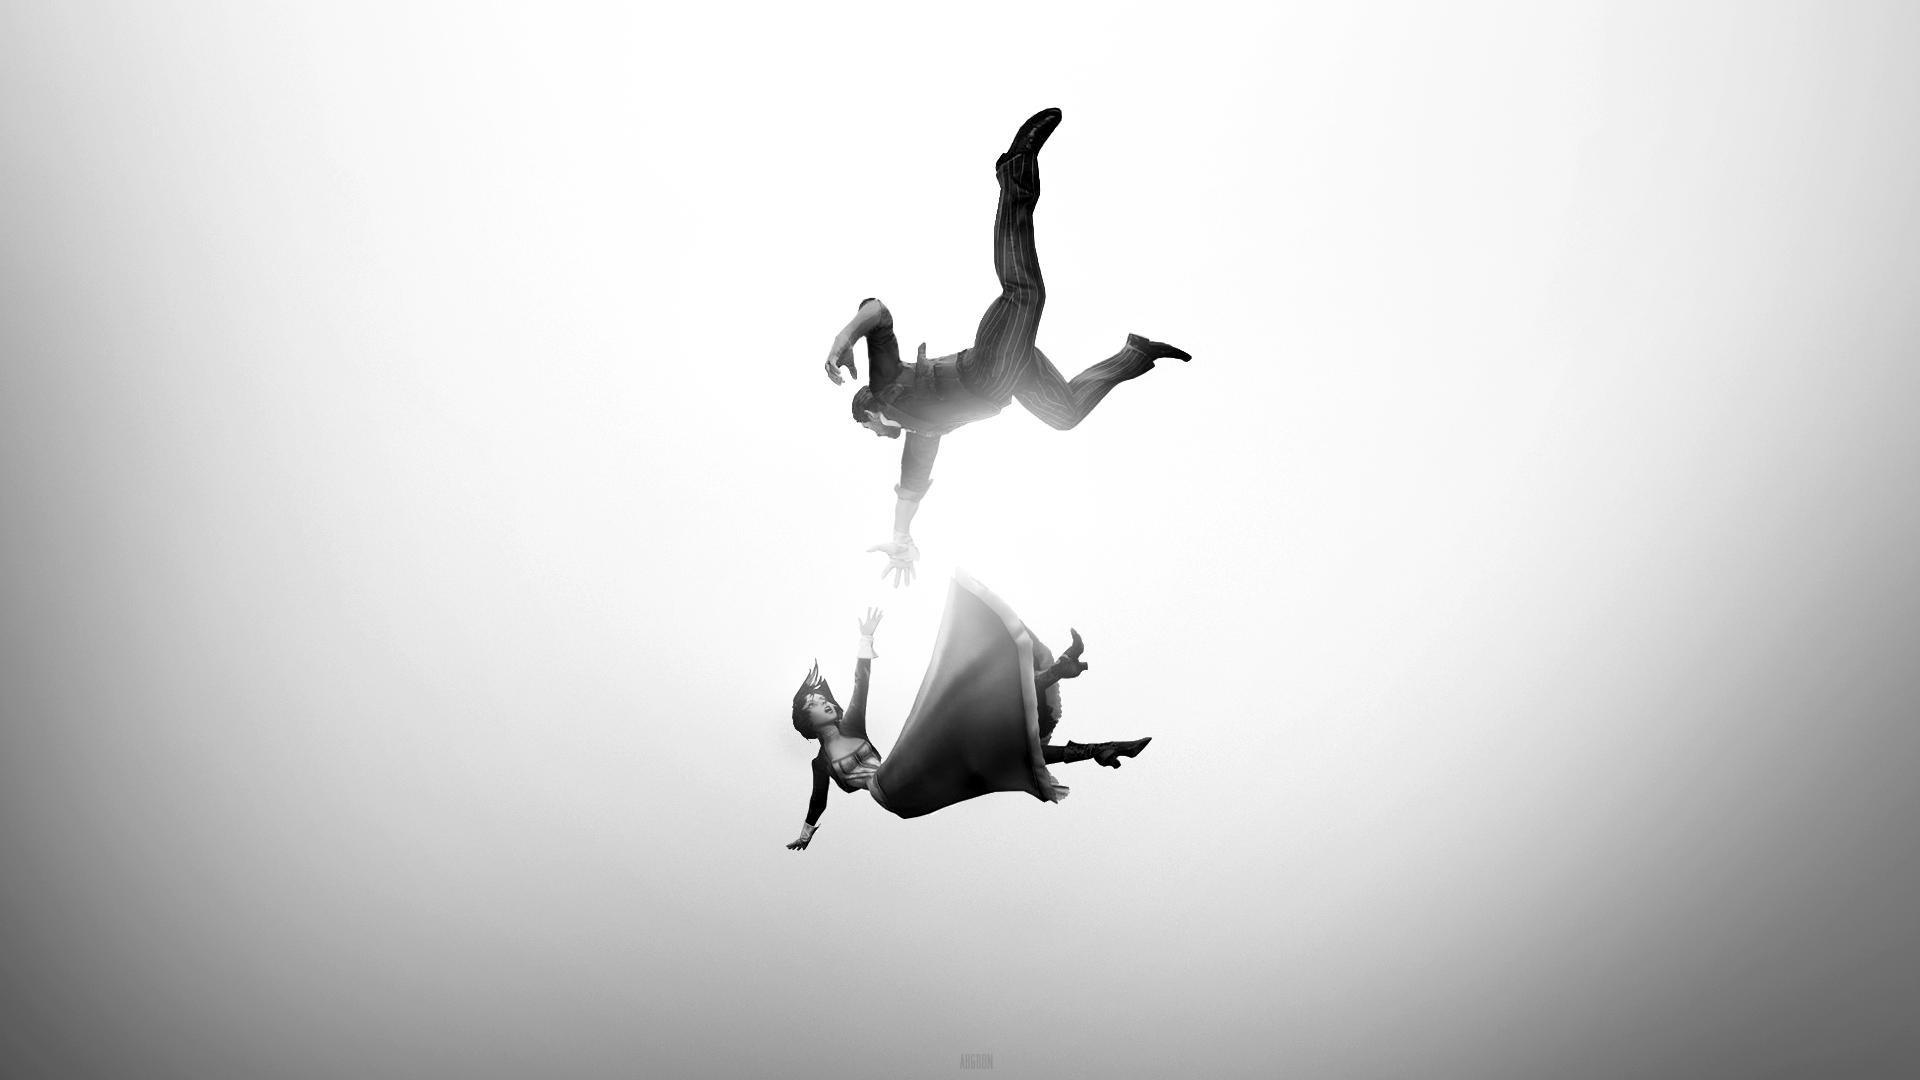 Wallpaper : video games, jumping, silhouette, falling ...